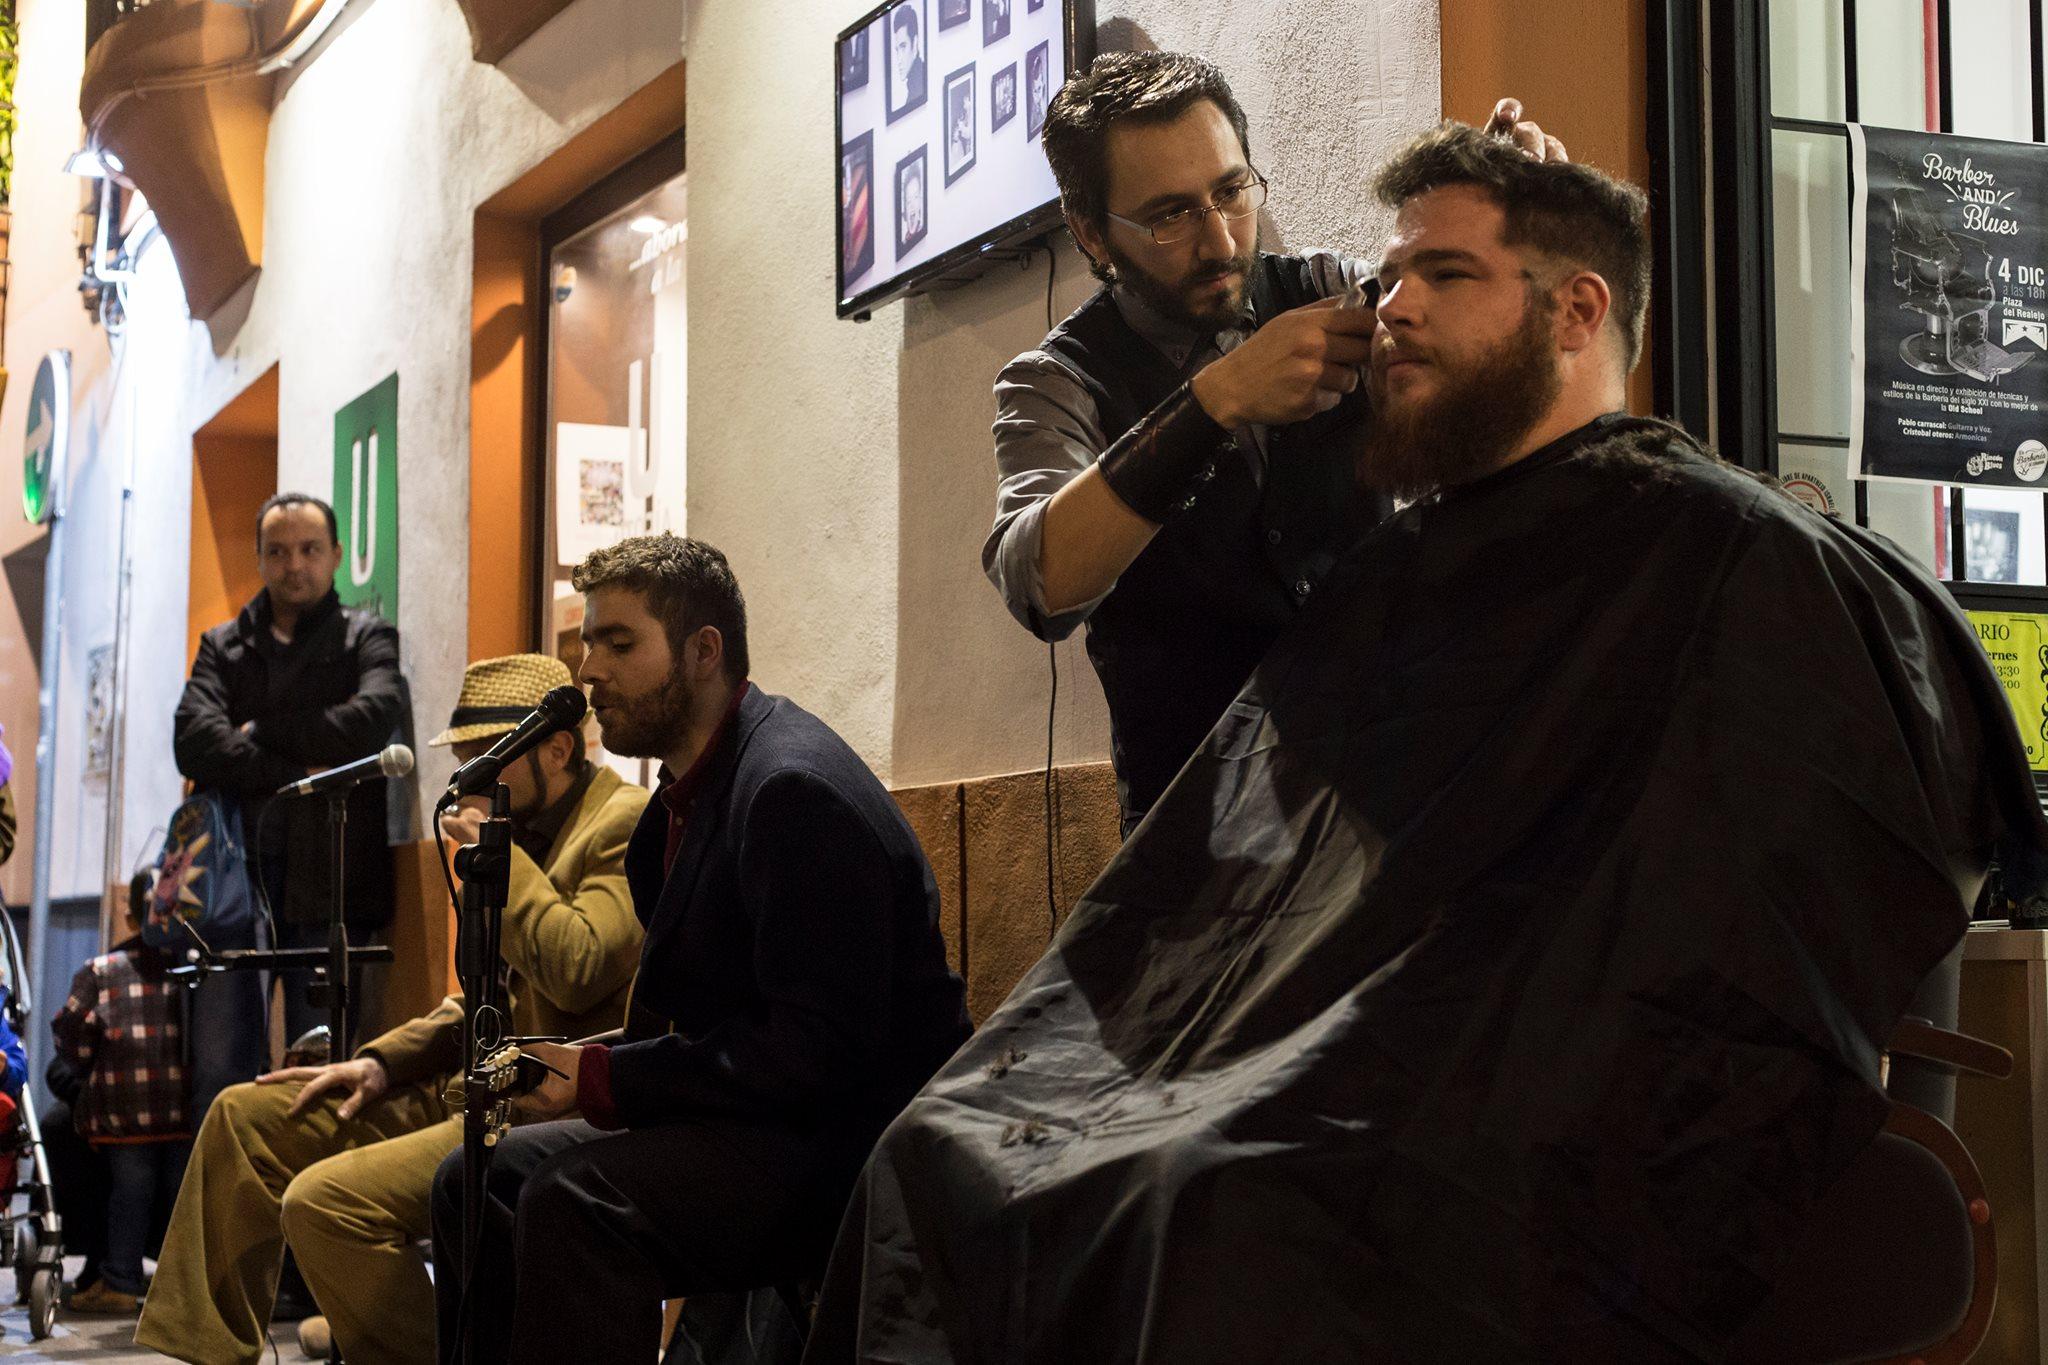 Show barber&blues